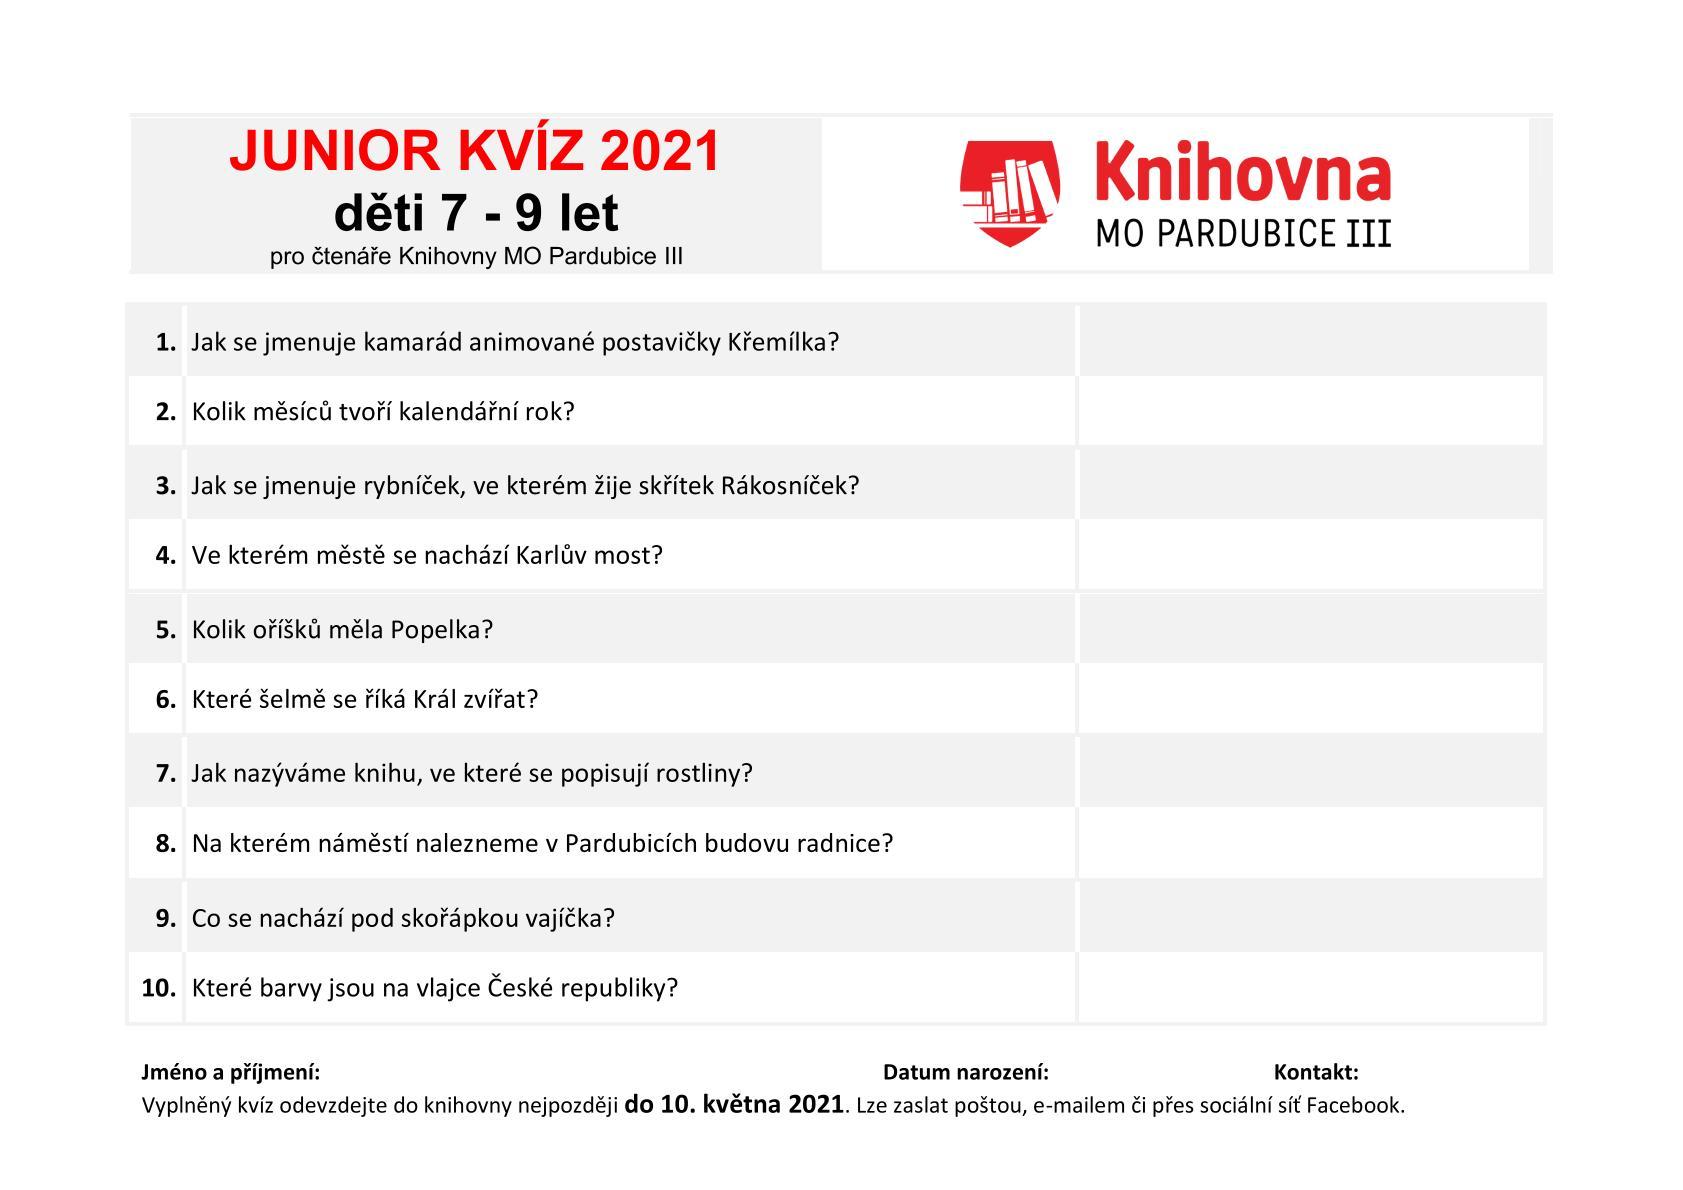 JUNIOR-KVIZ-7_9-let-2021